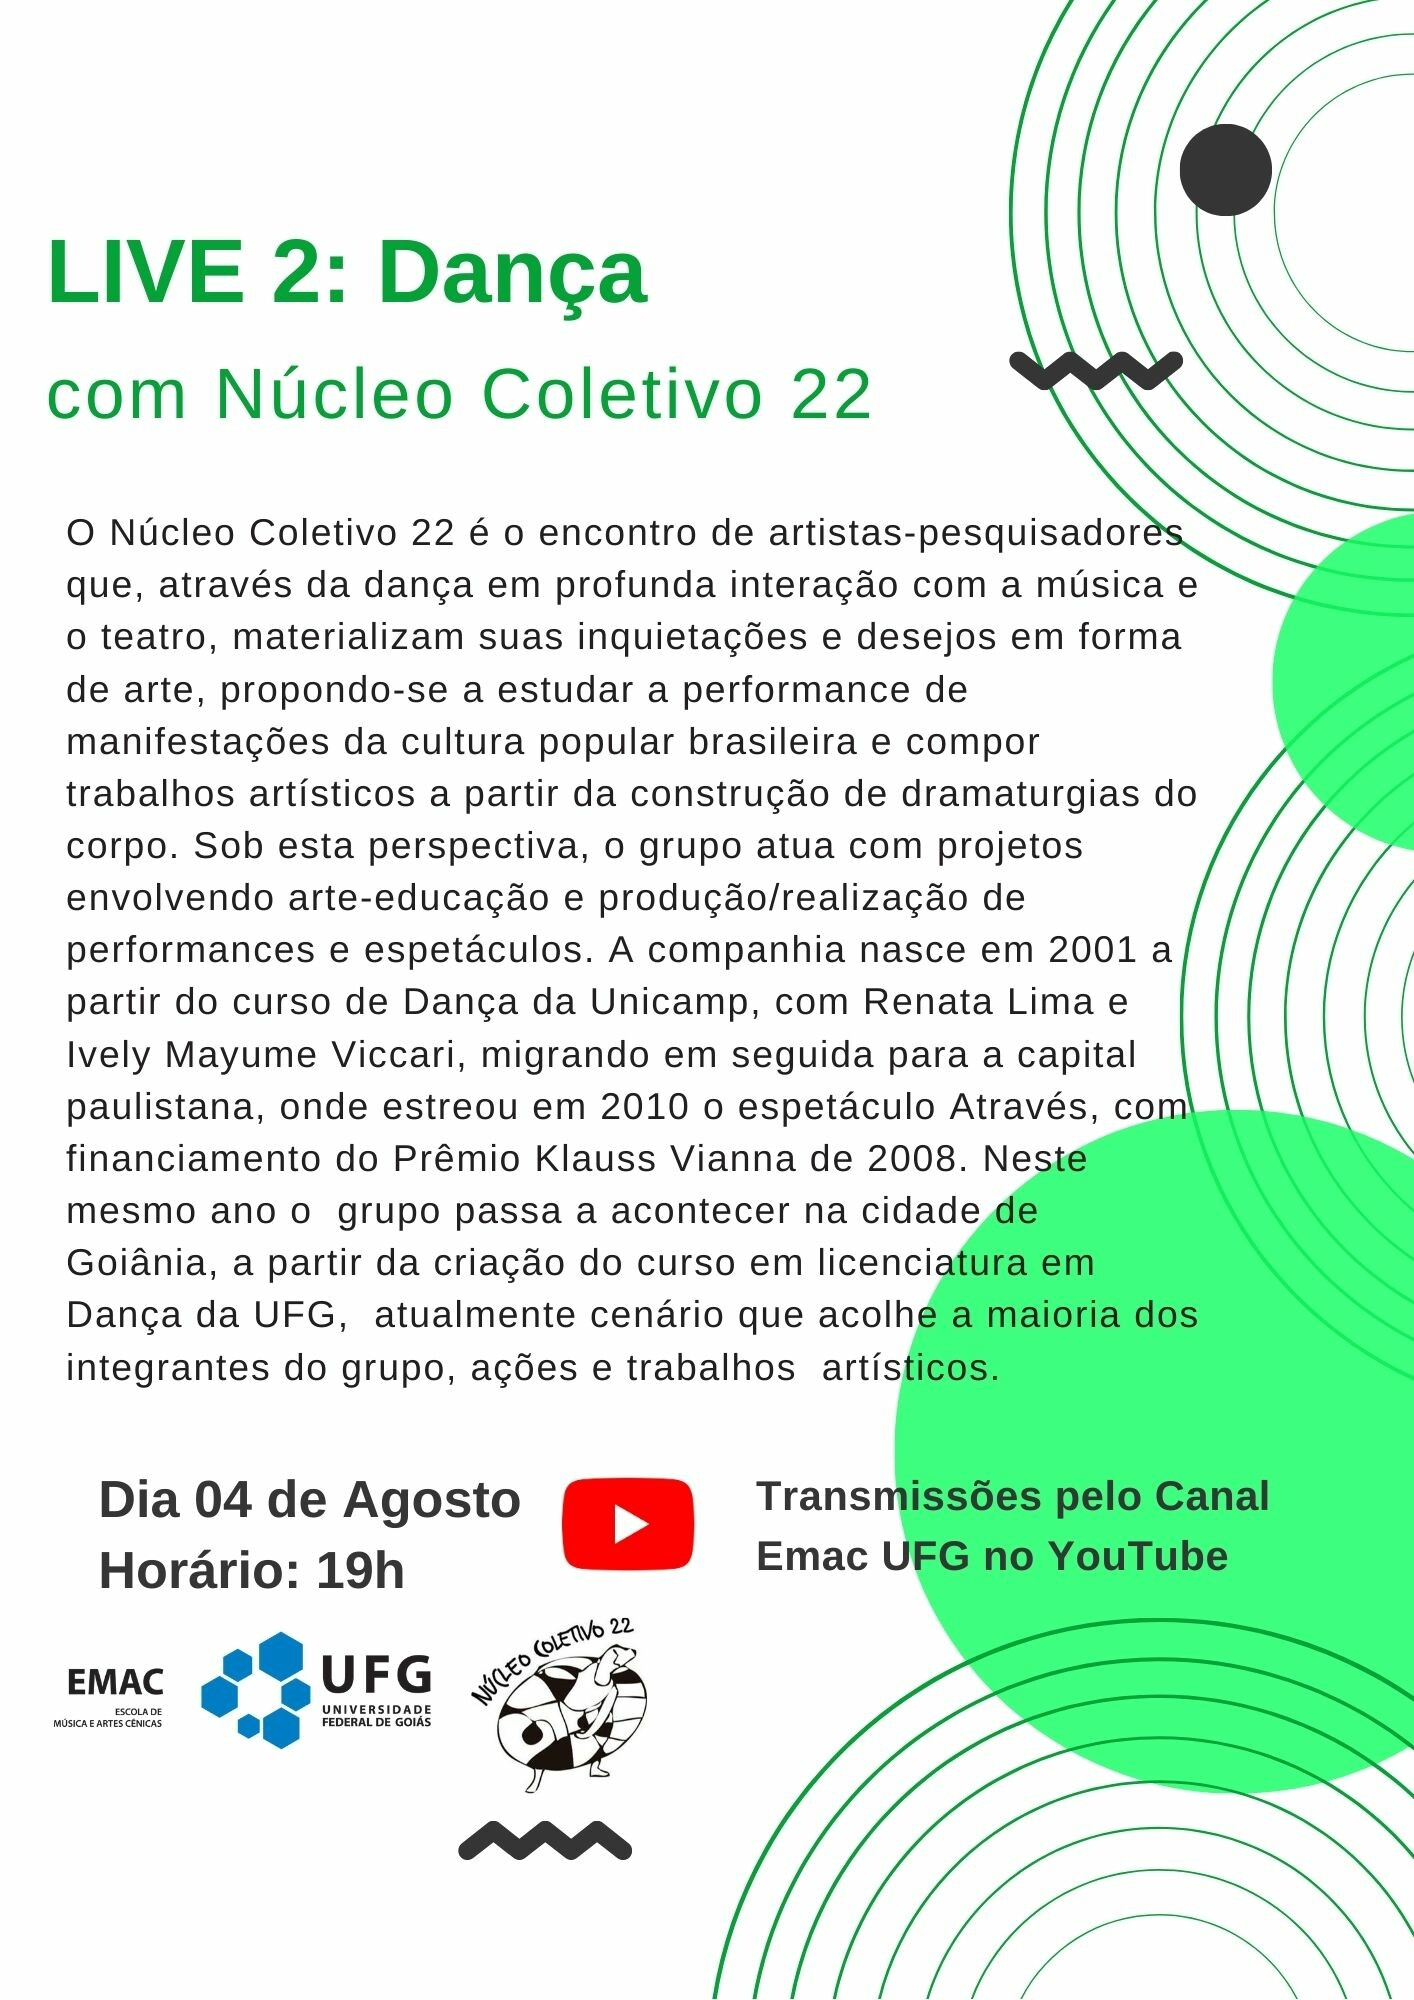 06 - Núcleo Coletivo 22